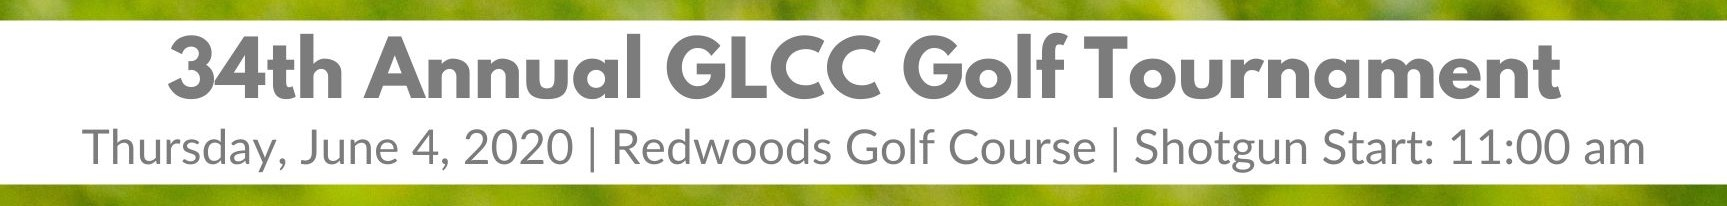 Golf-Tournament-Banner-Image.jpg